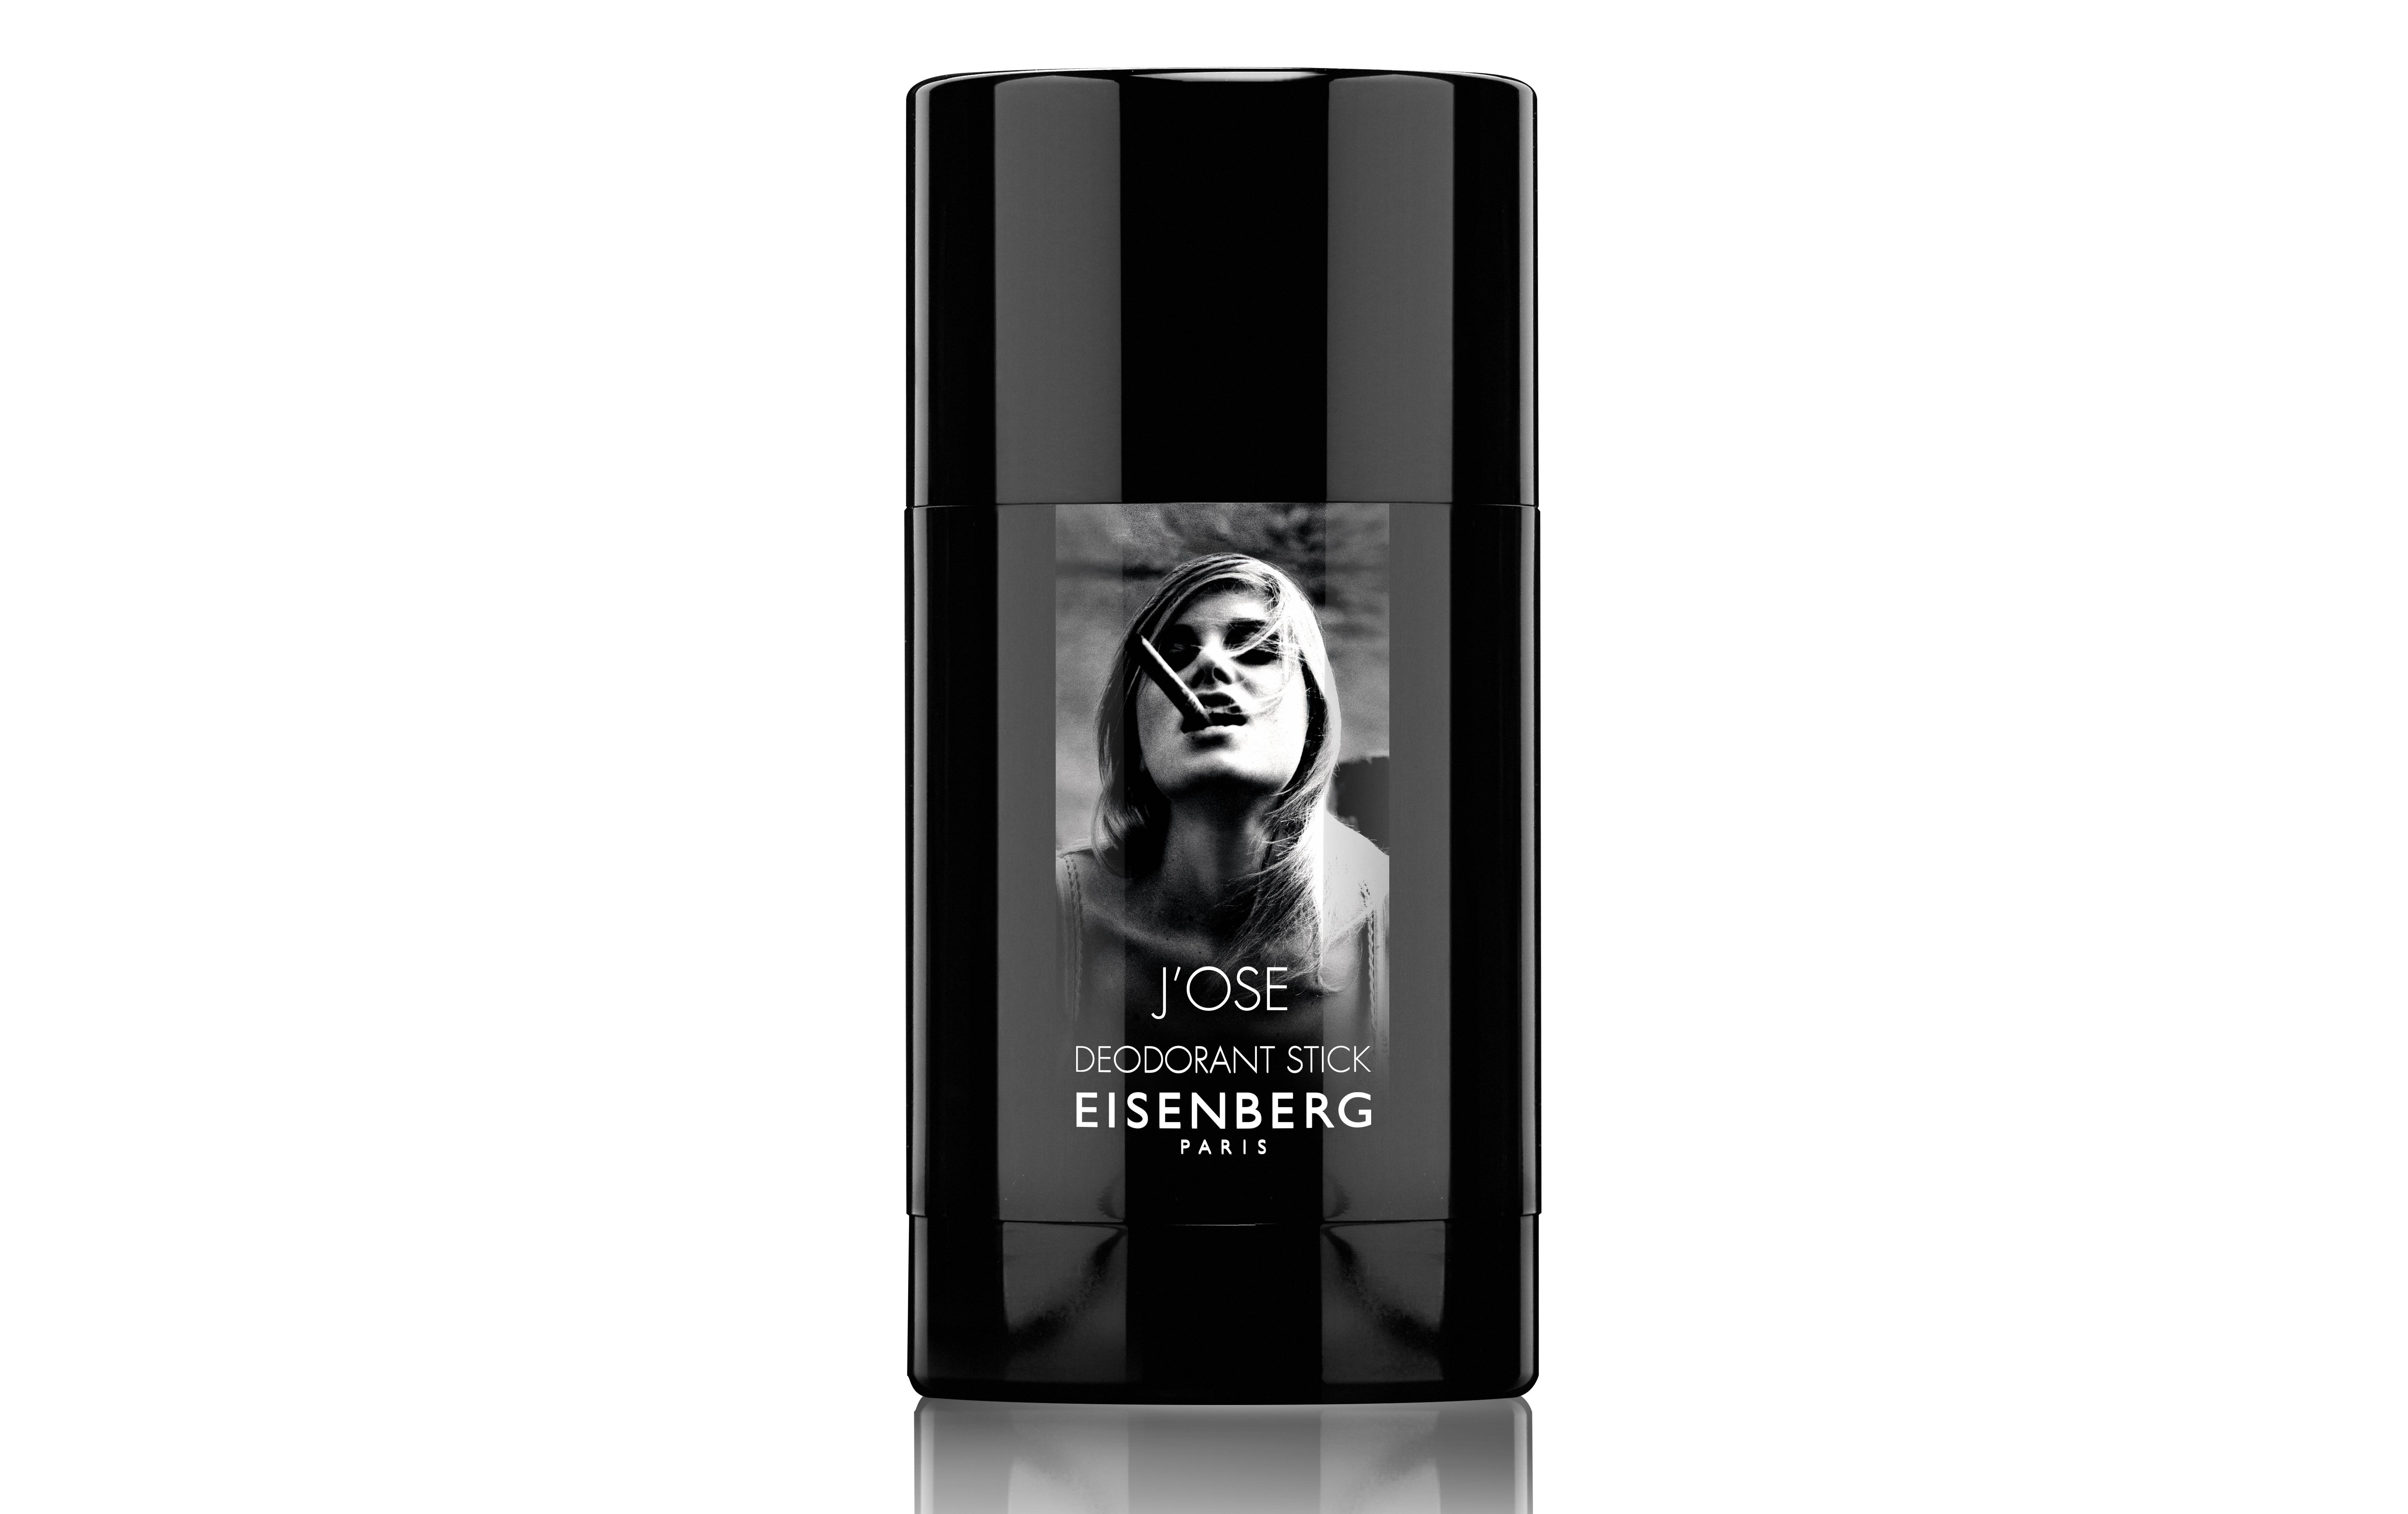 Дезодорант-стик J'Ose с ароматом культового парфюма Eisenberg